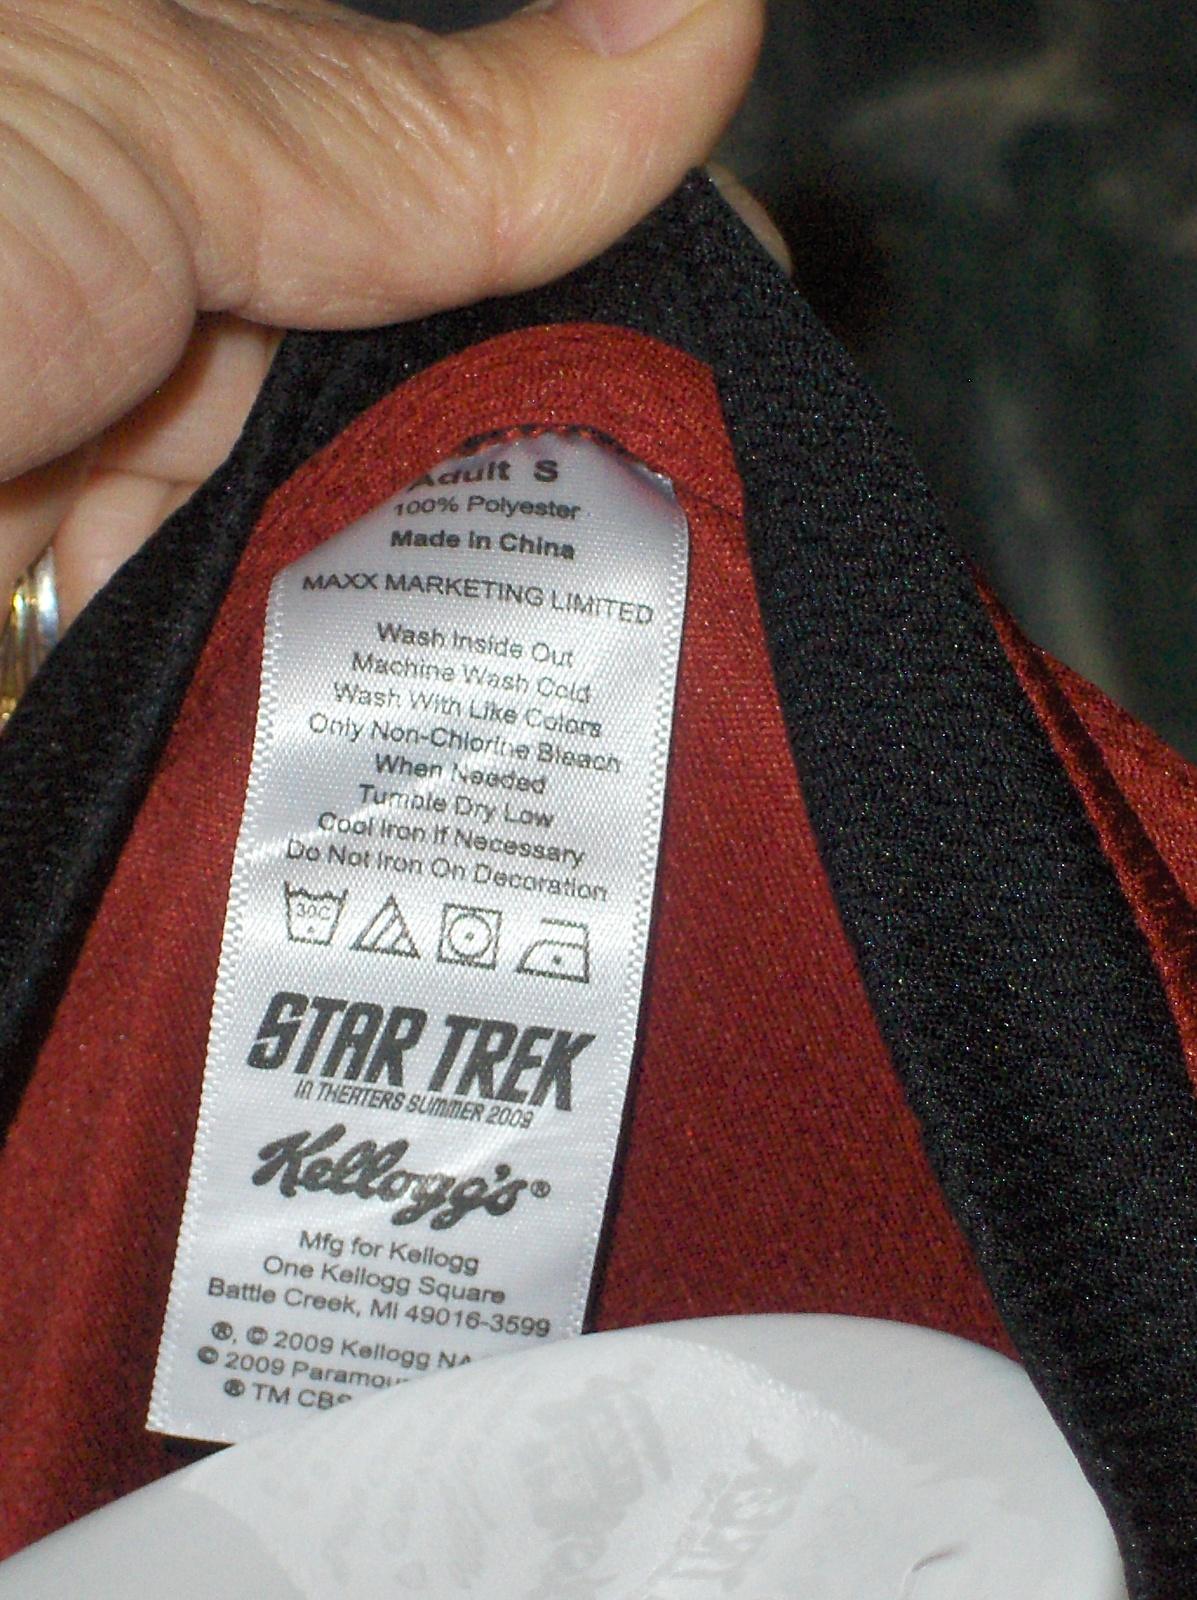 Kellogg's Star Trek Red T-Shirt Unisex Size Large  2009